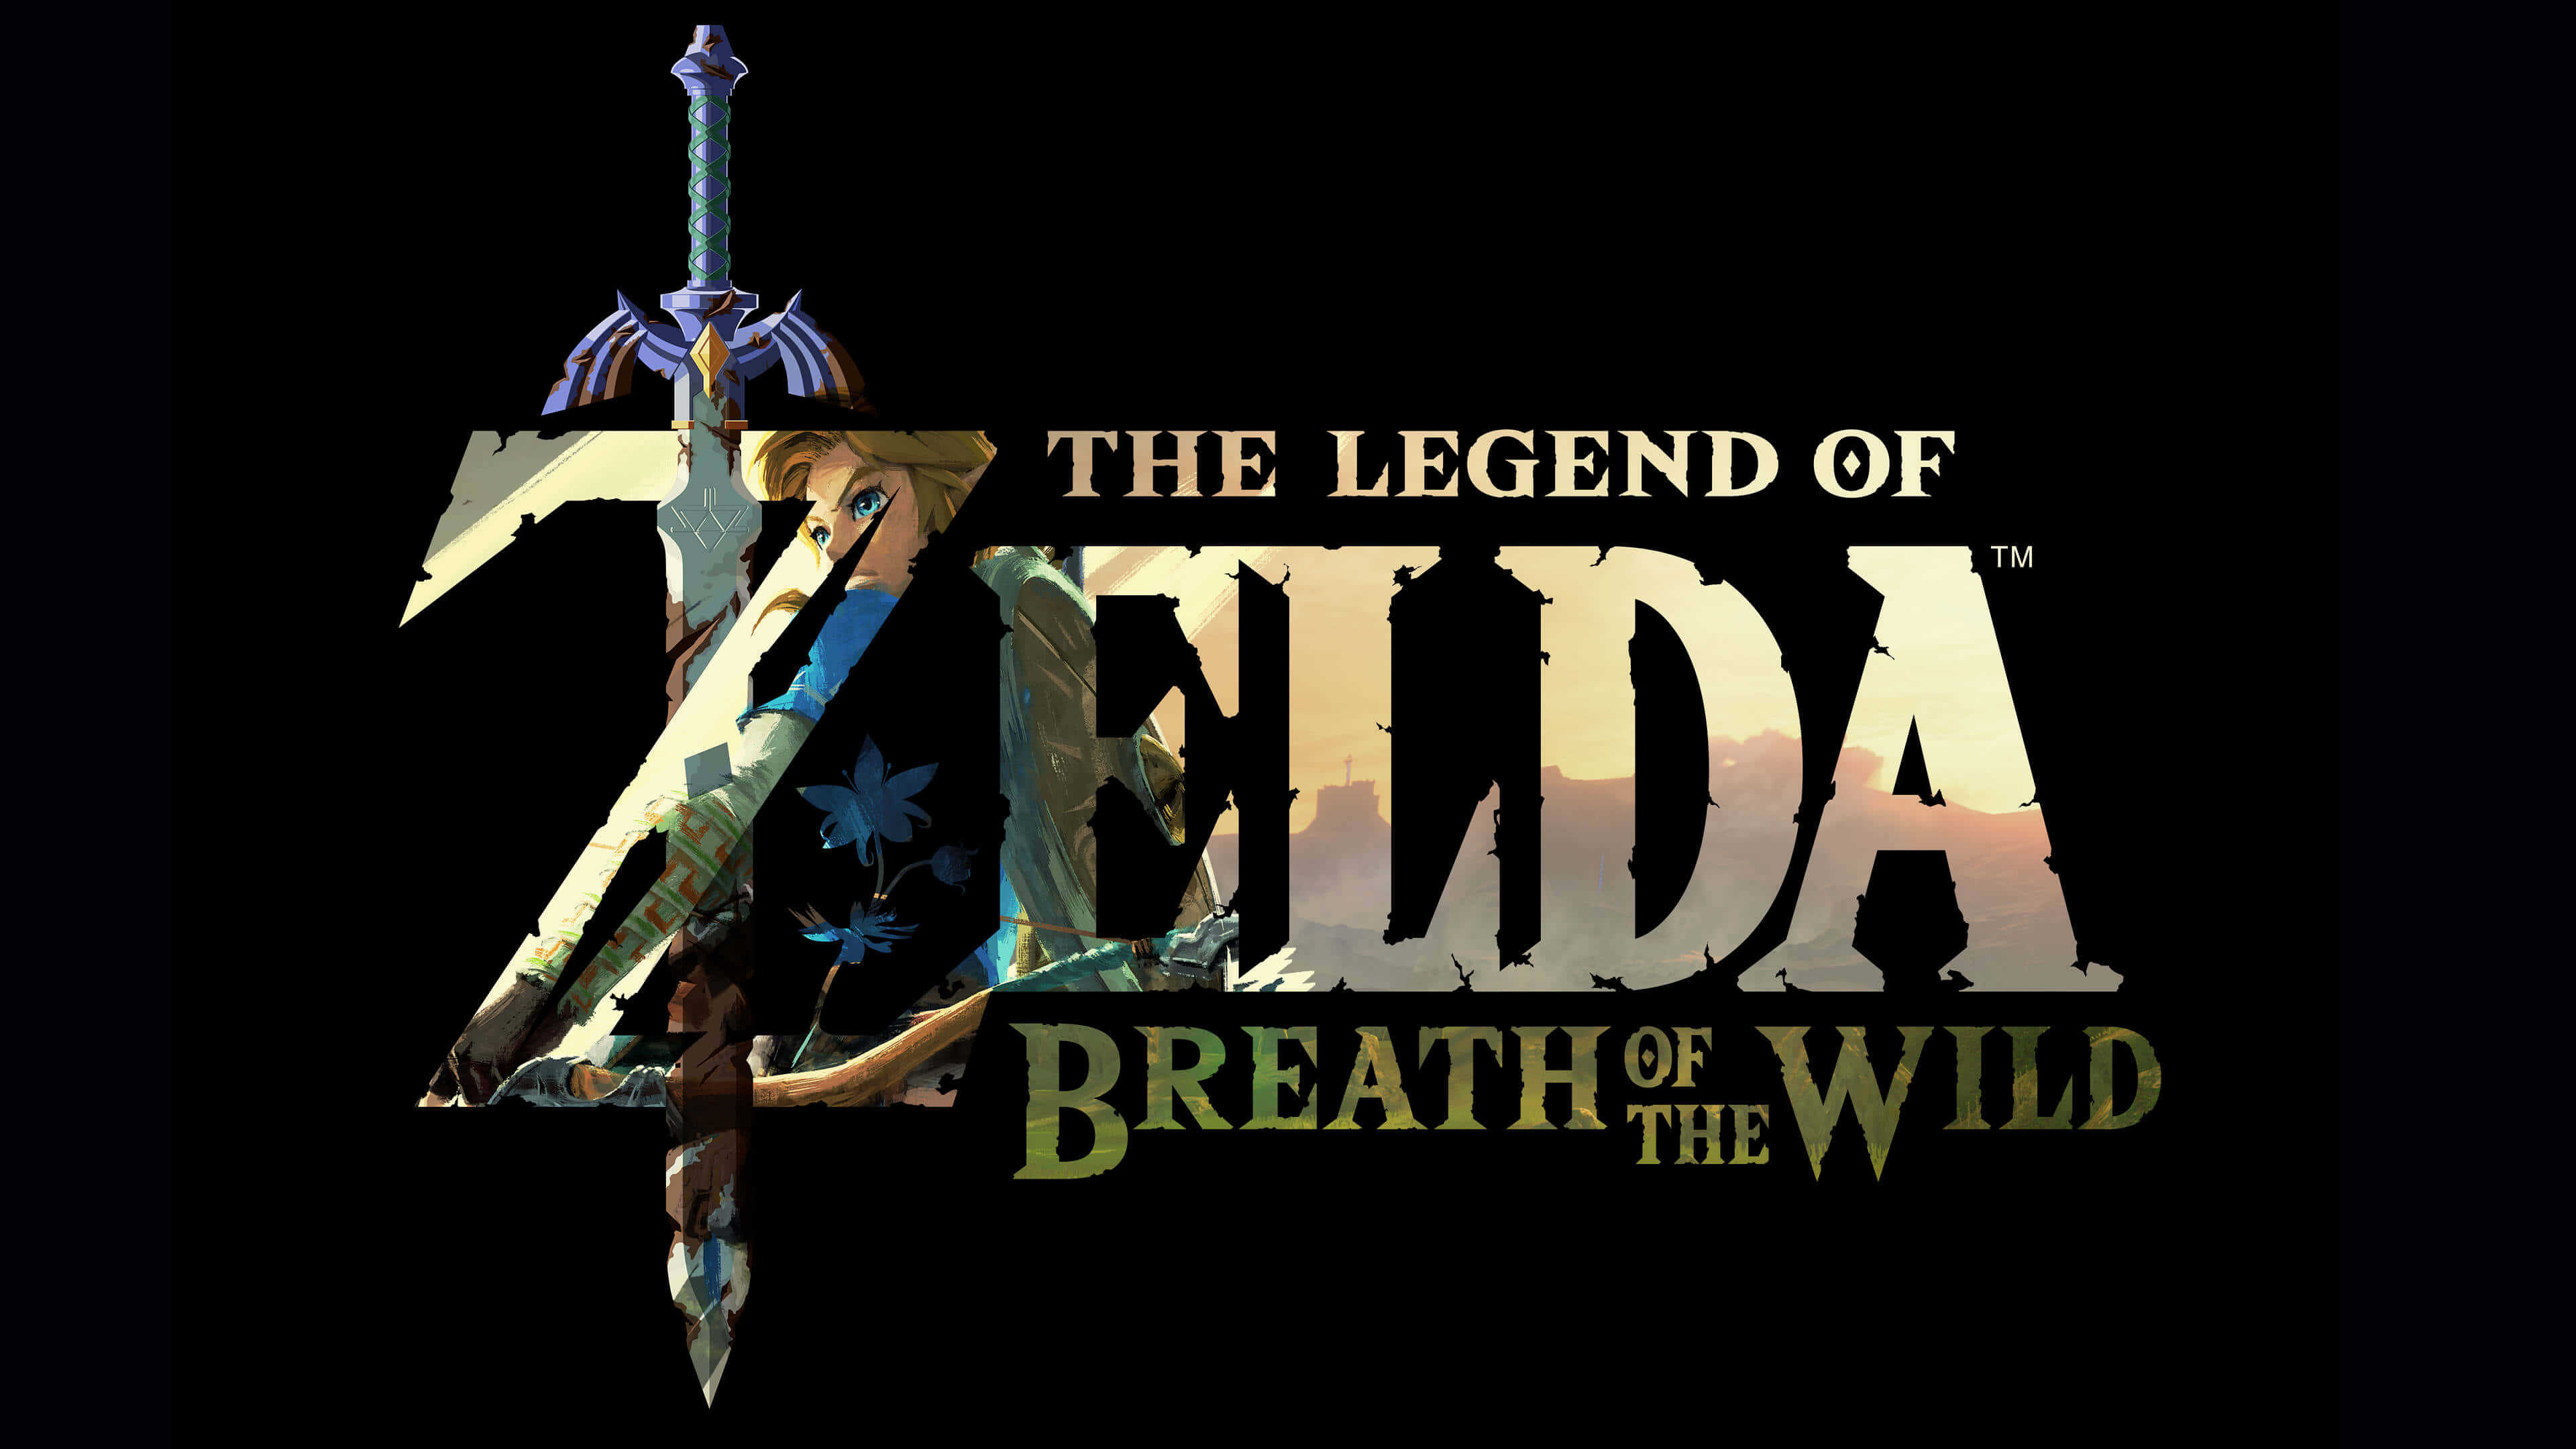 Zelda Breath Of The Wild Wallpaper Hd: The Legend Of Zelda: Breath Of The Wild UHD 4K Wallpaper